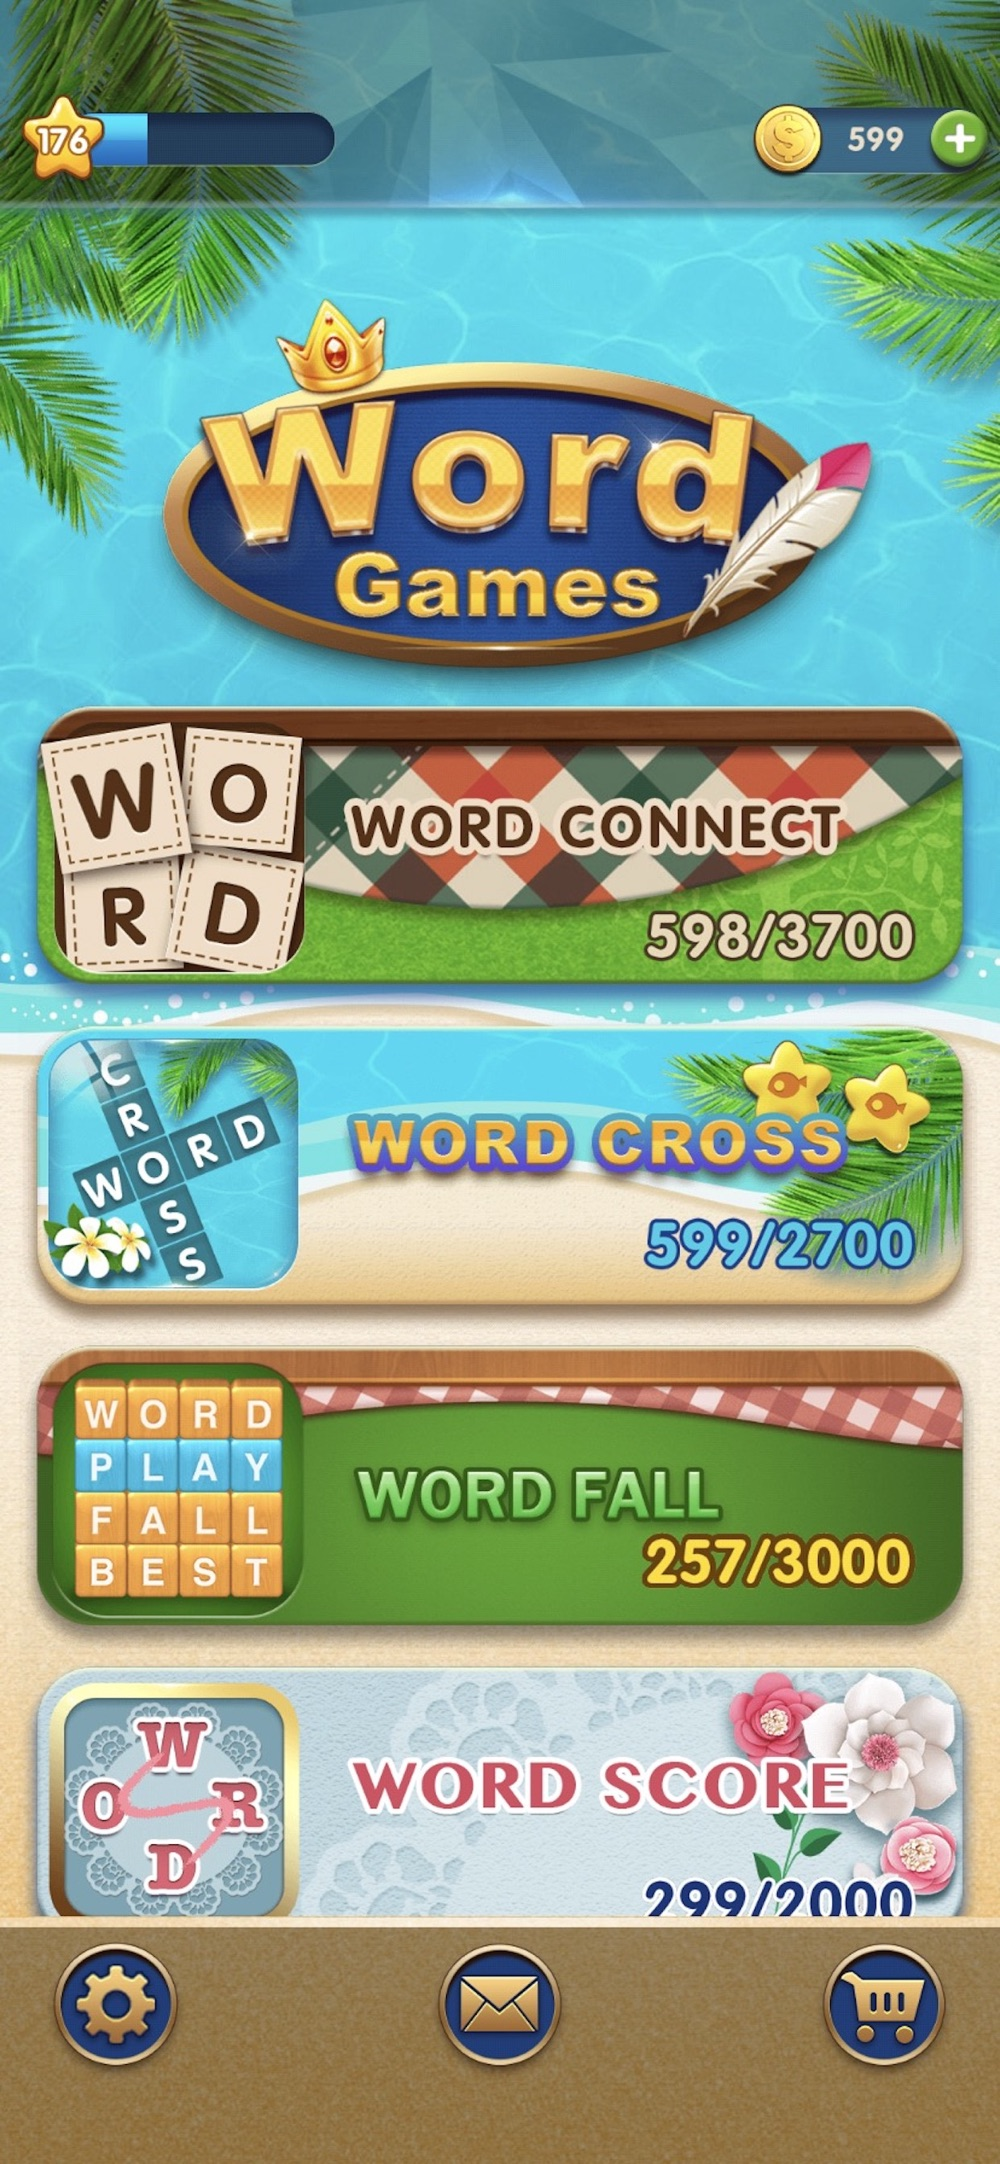 WordGames: Cross,Connect,Score Cheat Codes